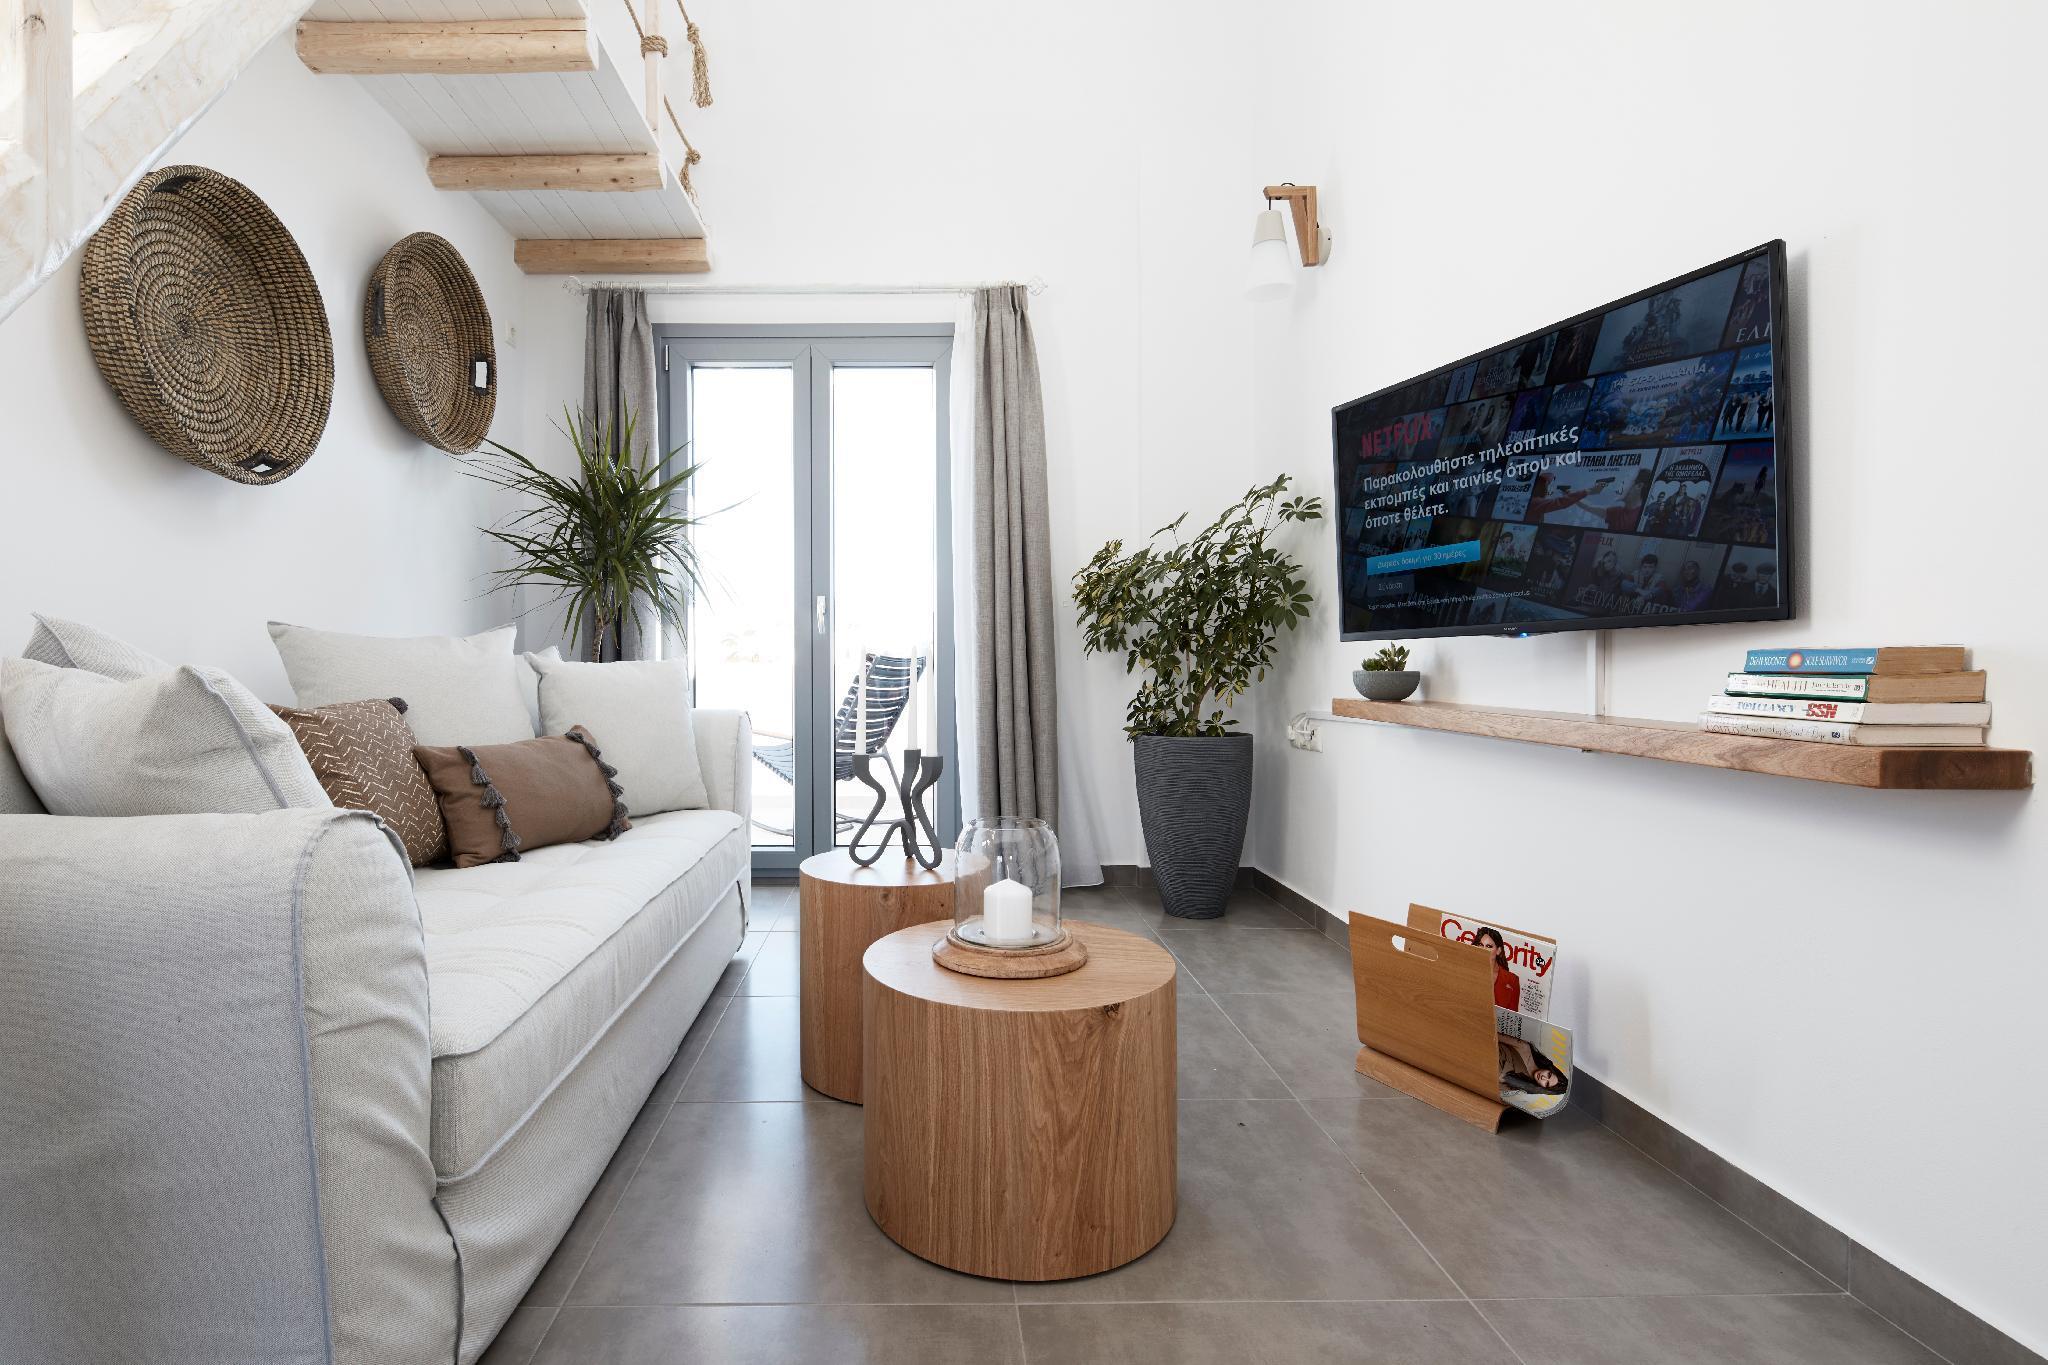 Pnoi Suites 2 Bedroom Split Level Apartment